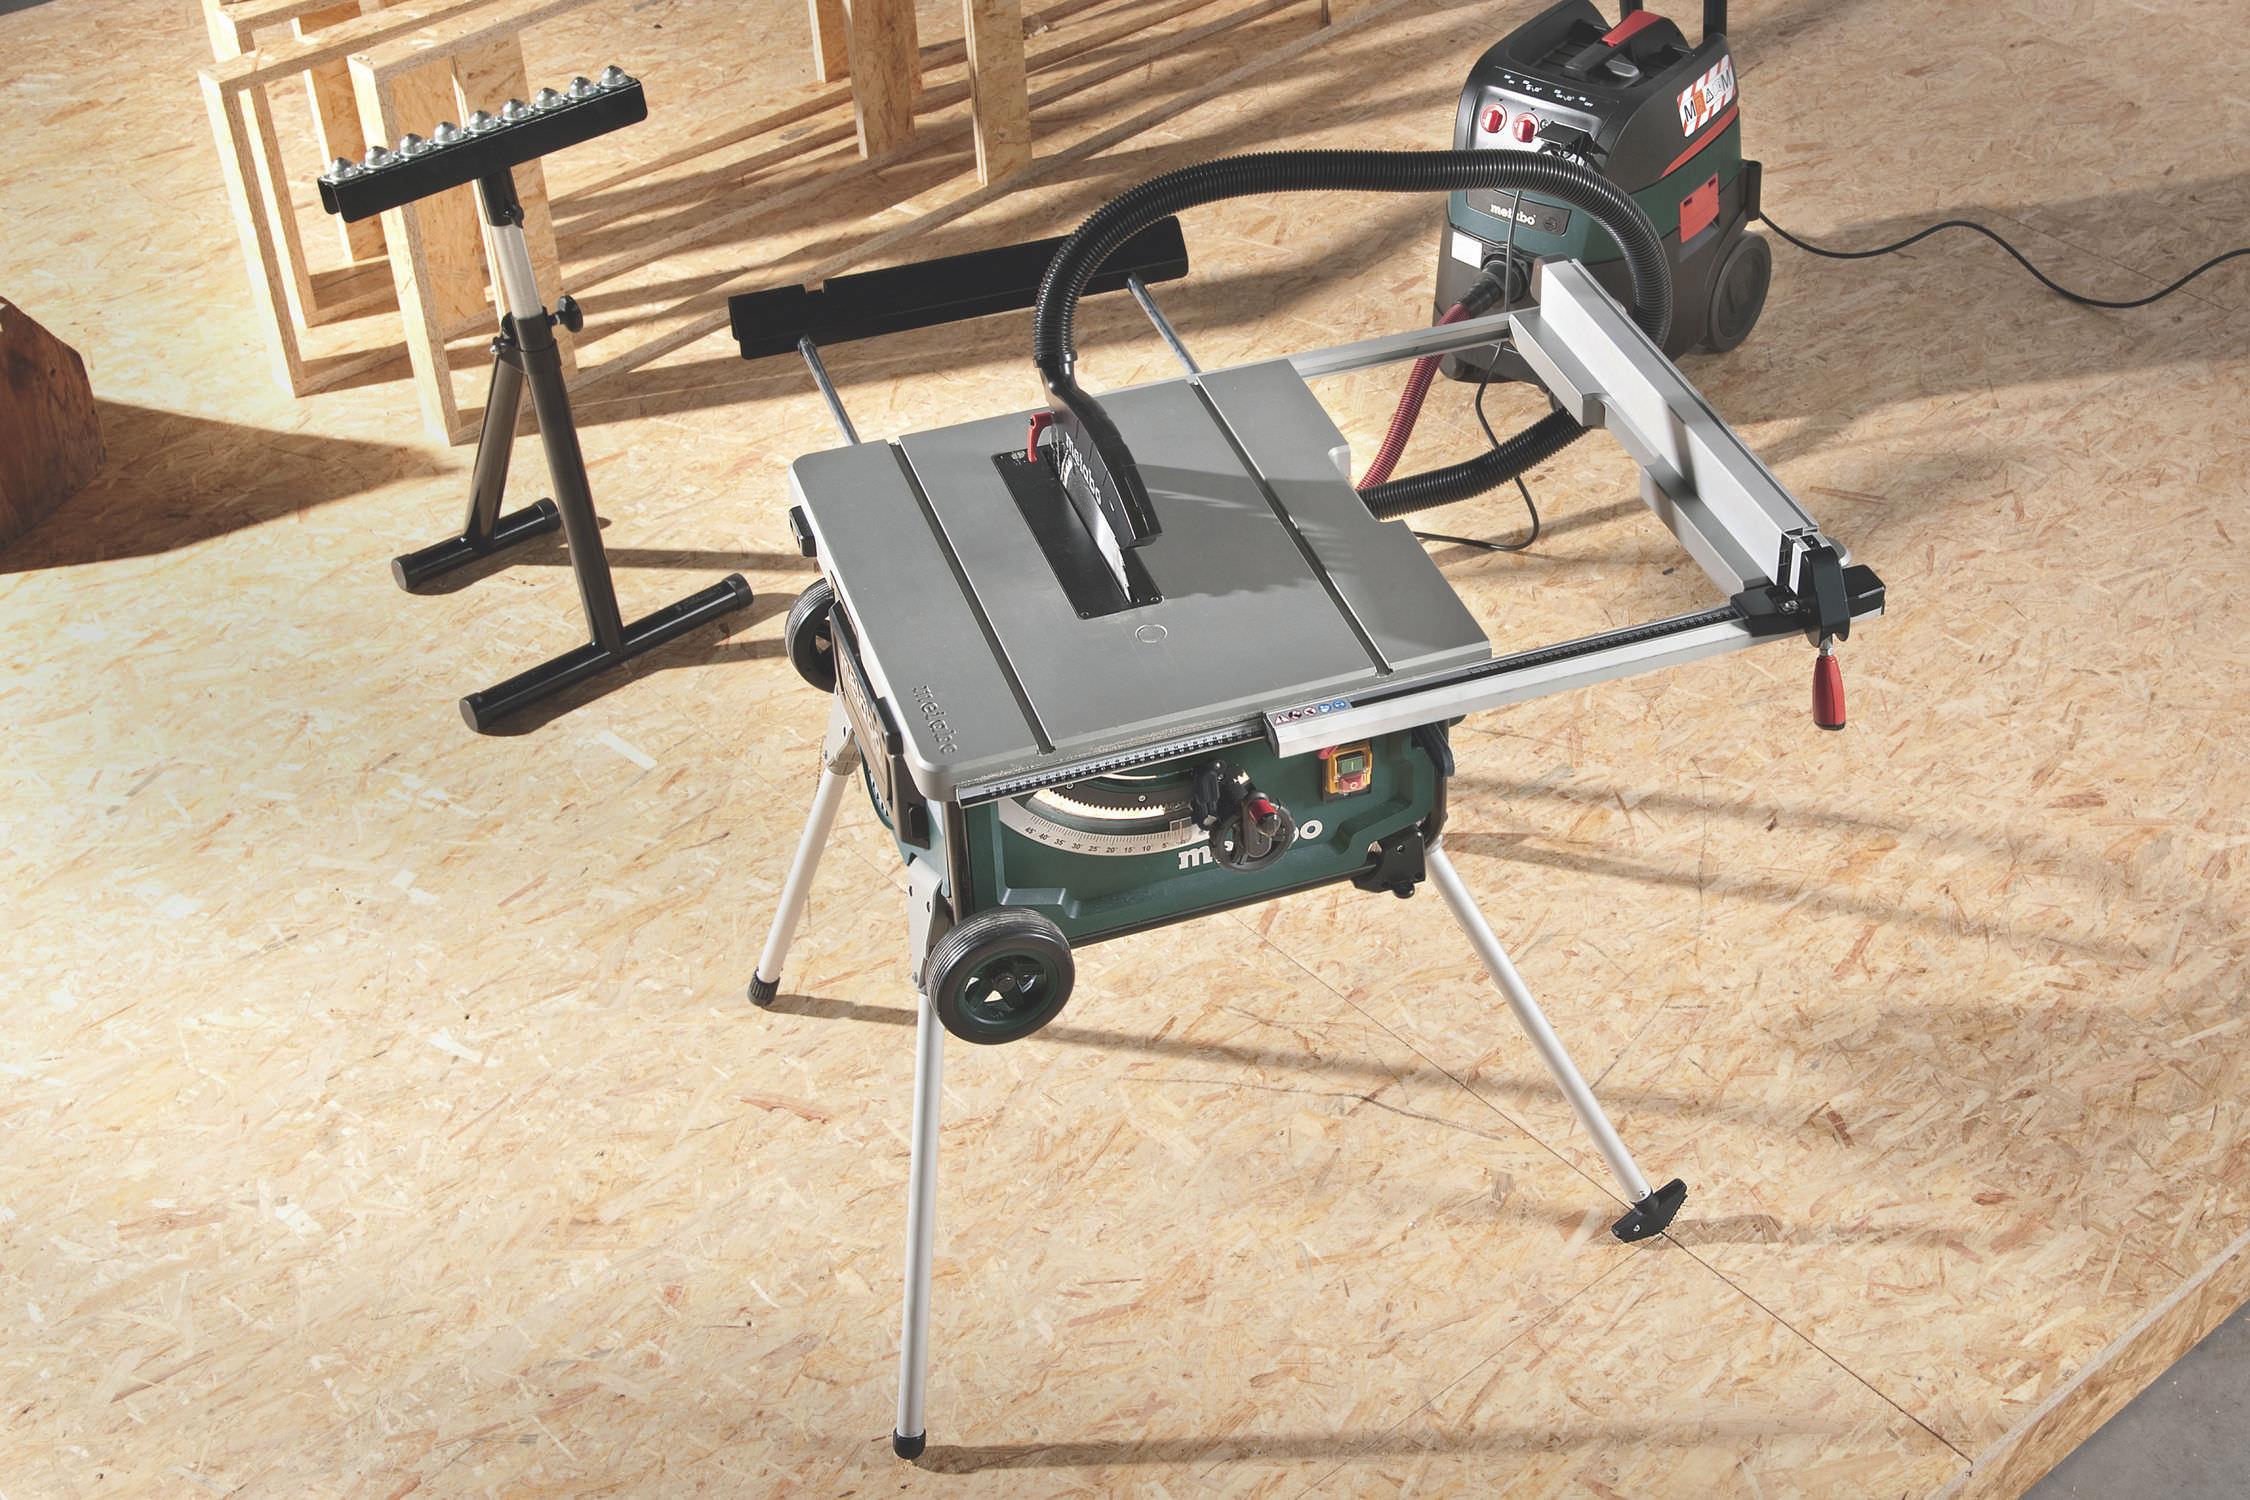 ... Sliding Table Saw / For Steel / Tabletop TS 254 Metabowerke ...